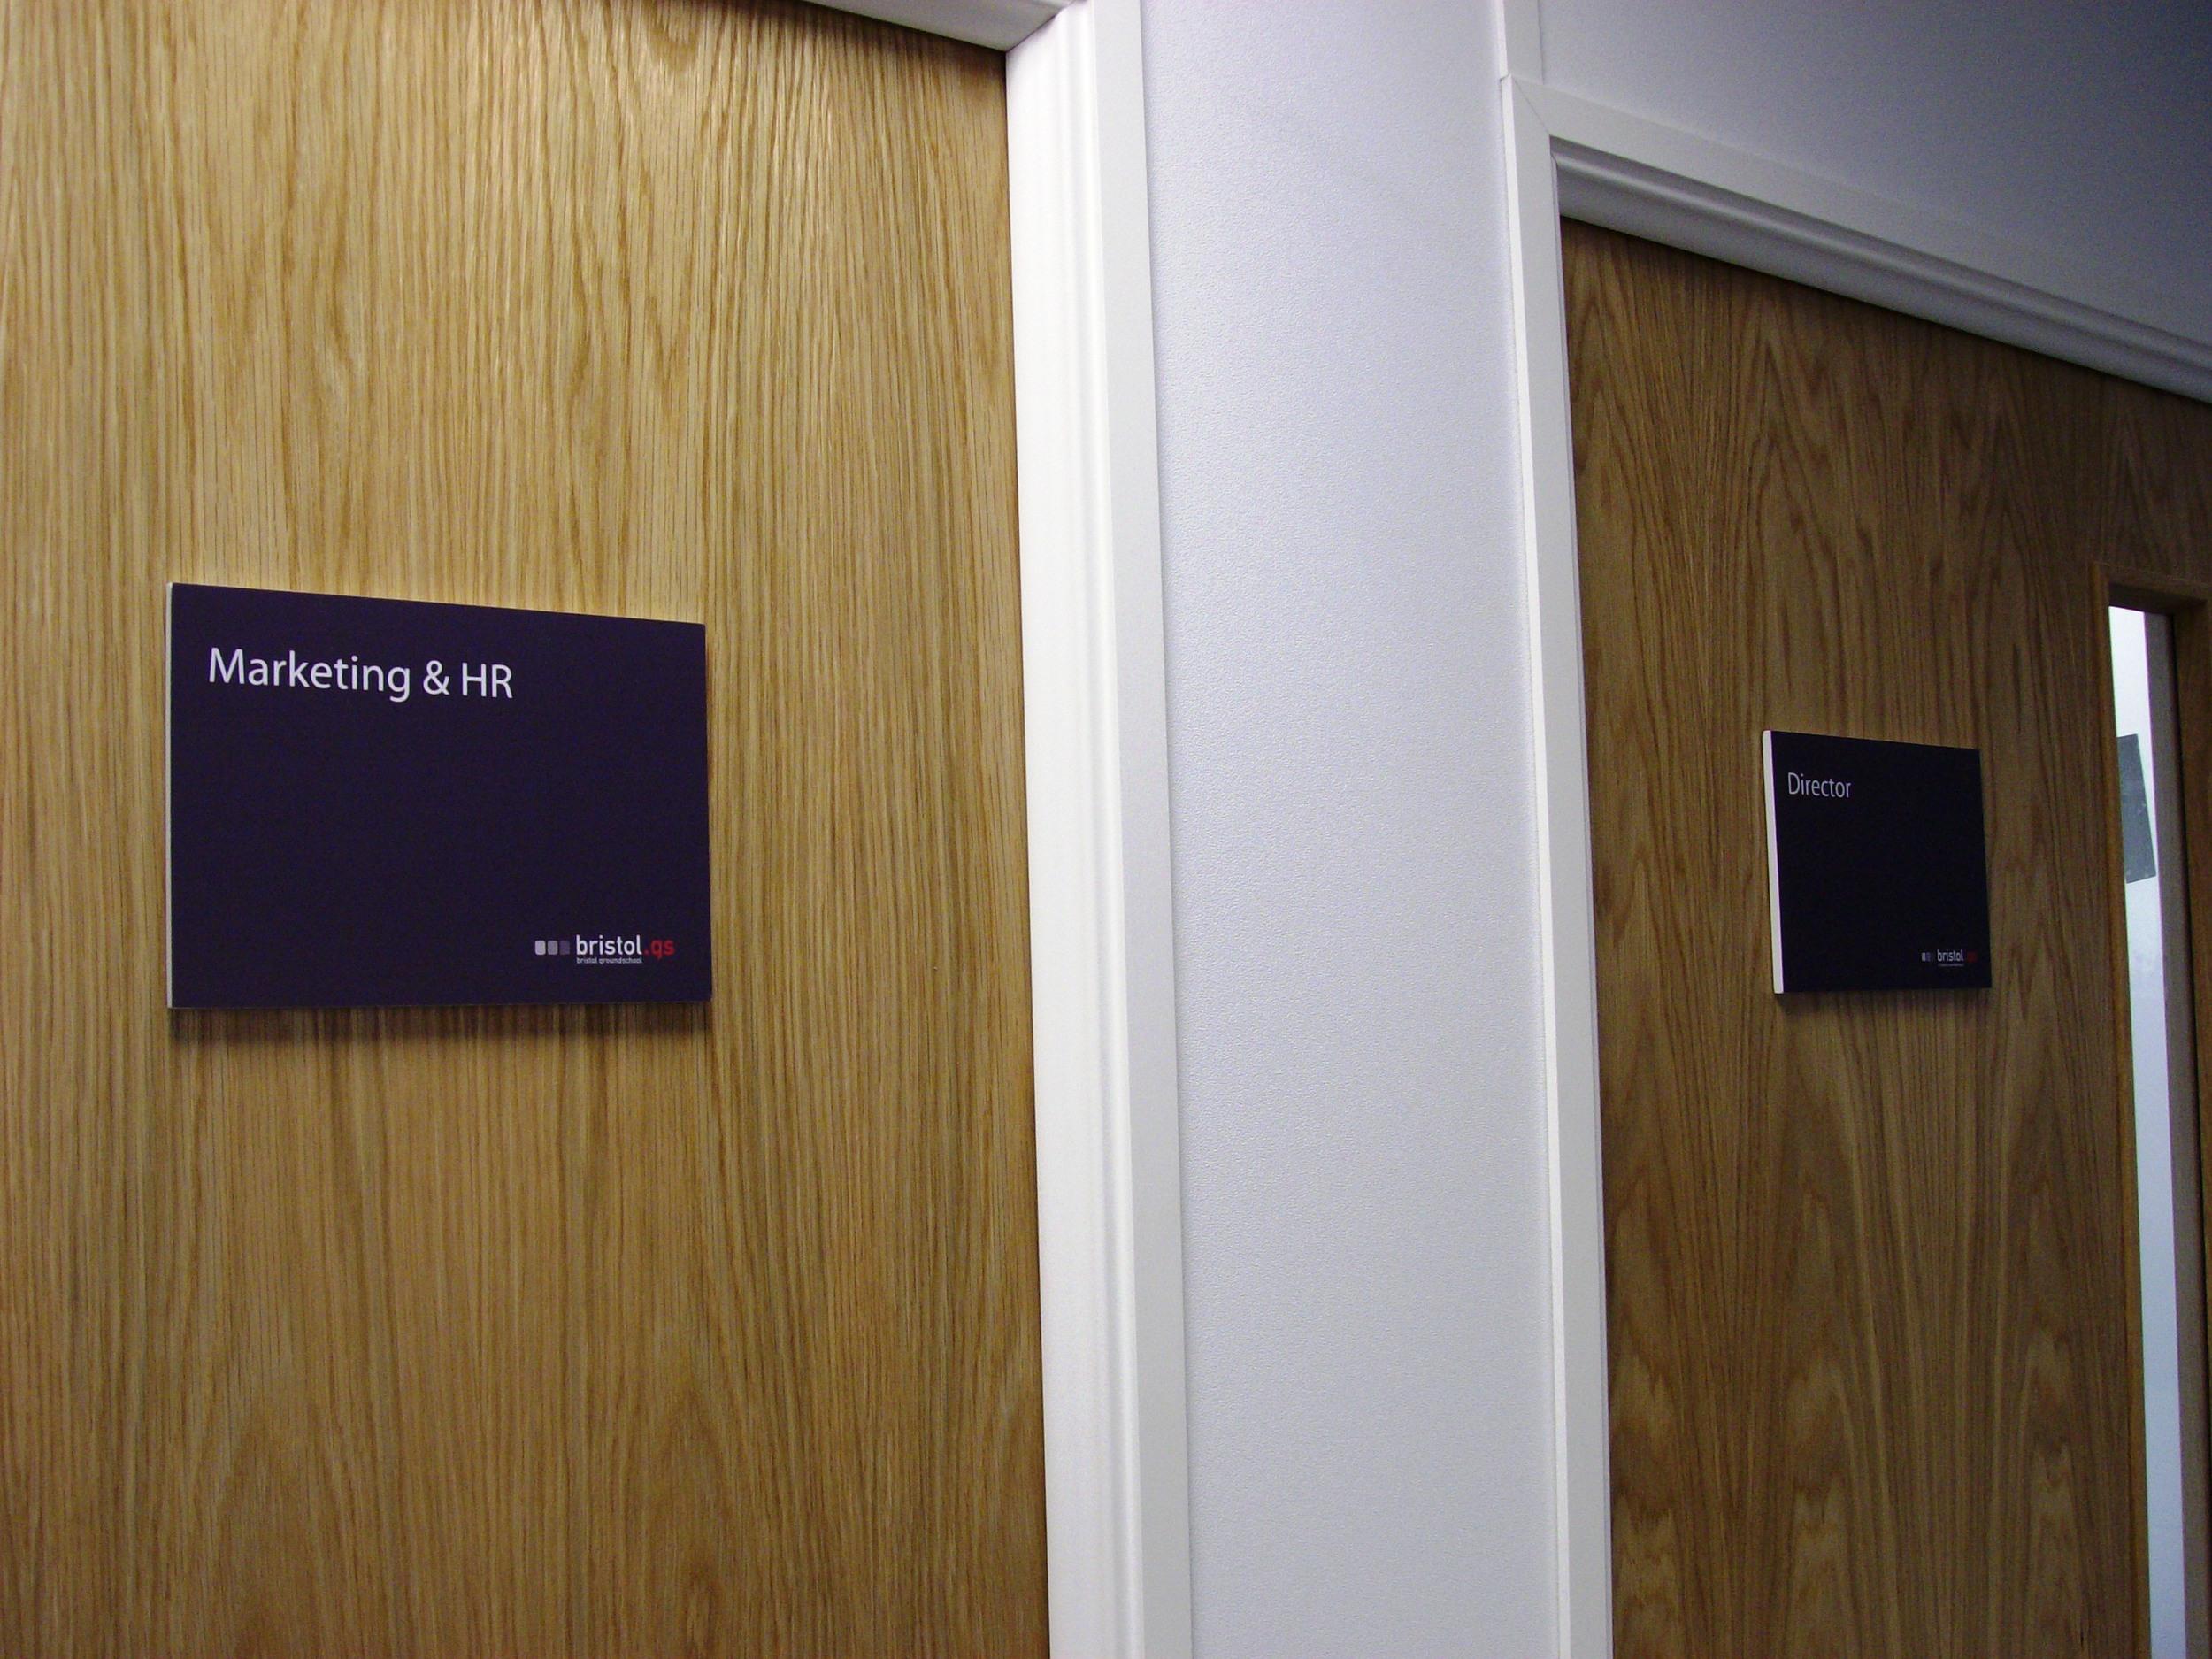 Mark A Humphries bristol groundschoool door signs.jpg